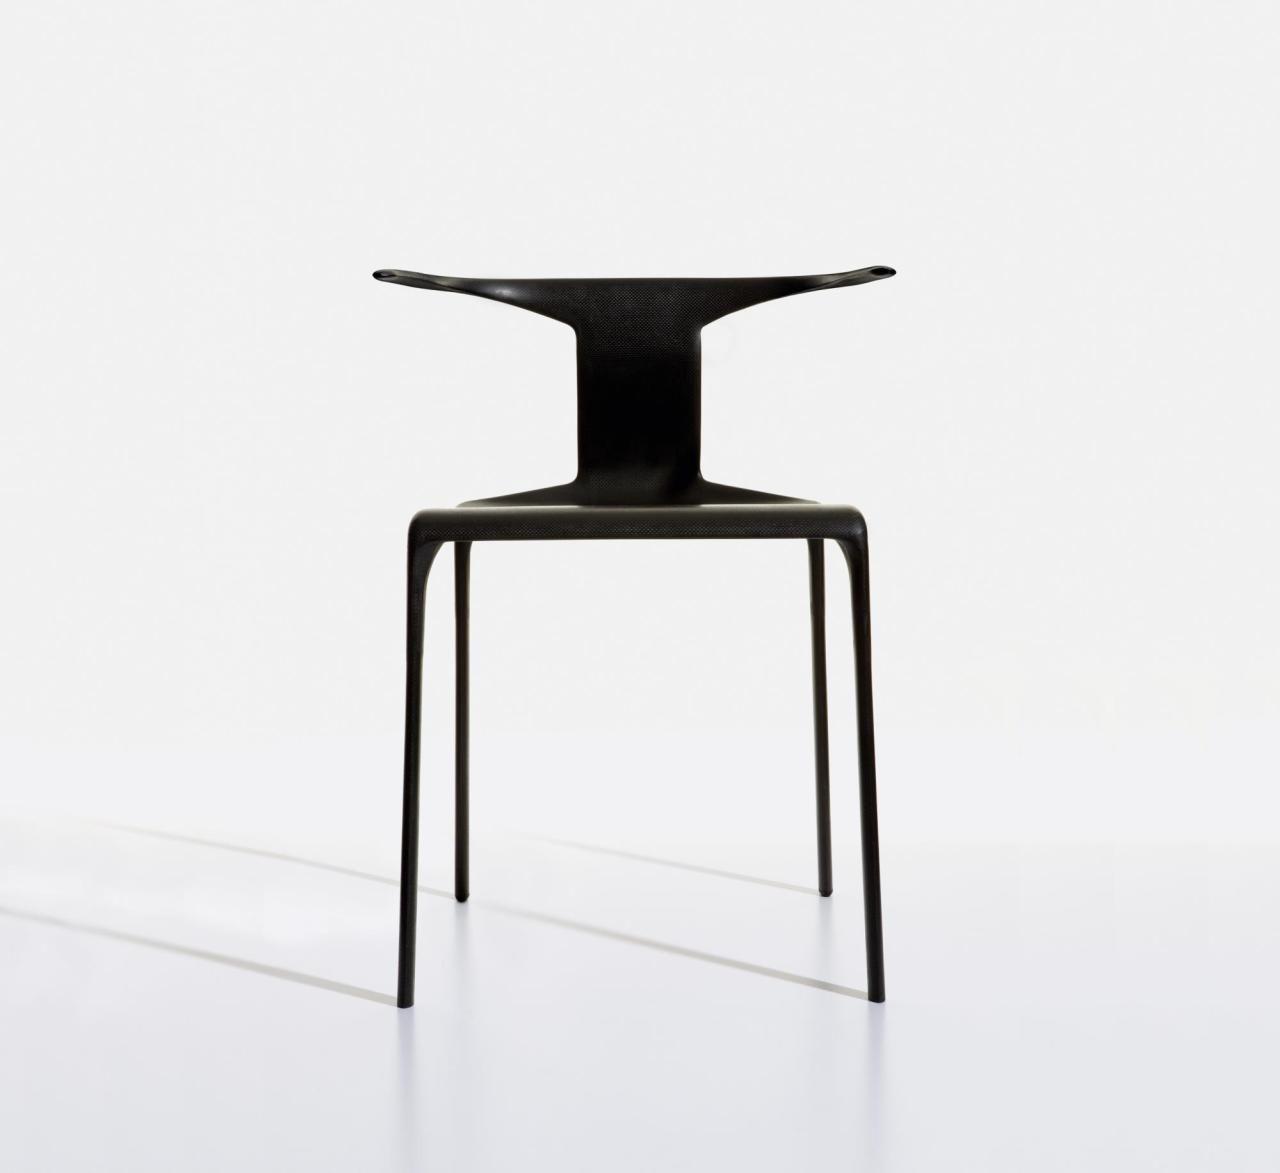 Light Light Armchair By Alberto Meda Produced By Alias Italy Designwithorbital Armchair Furniture Design Modern Furniture